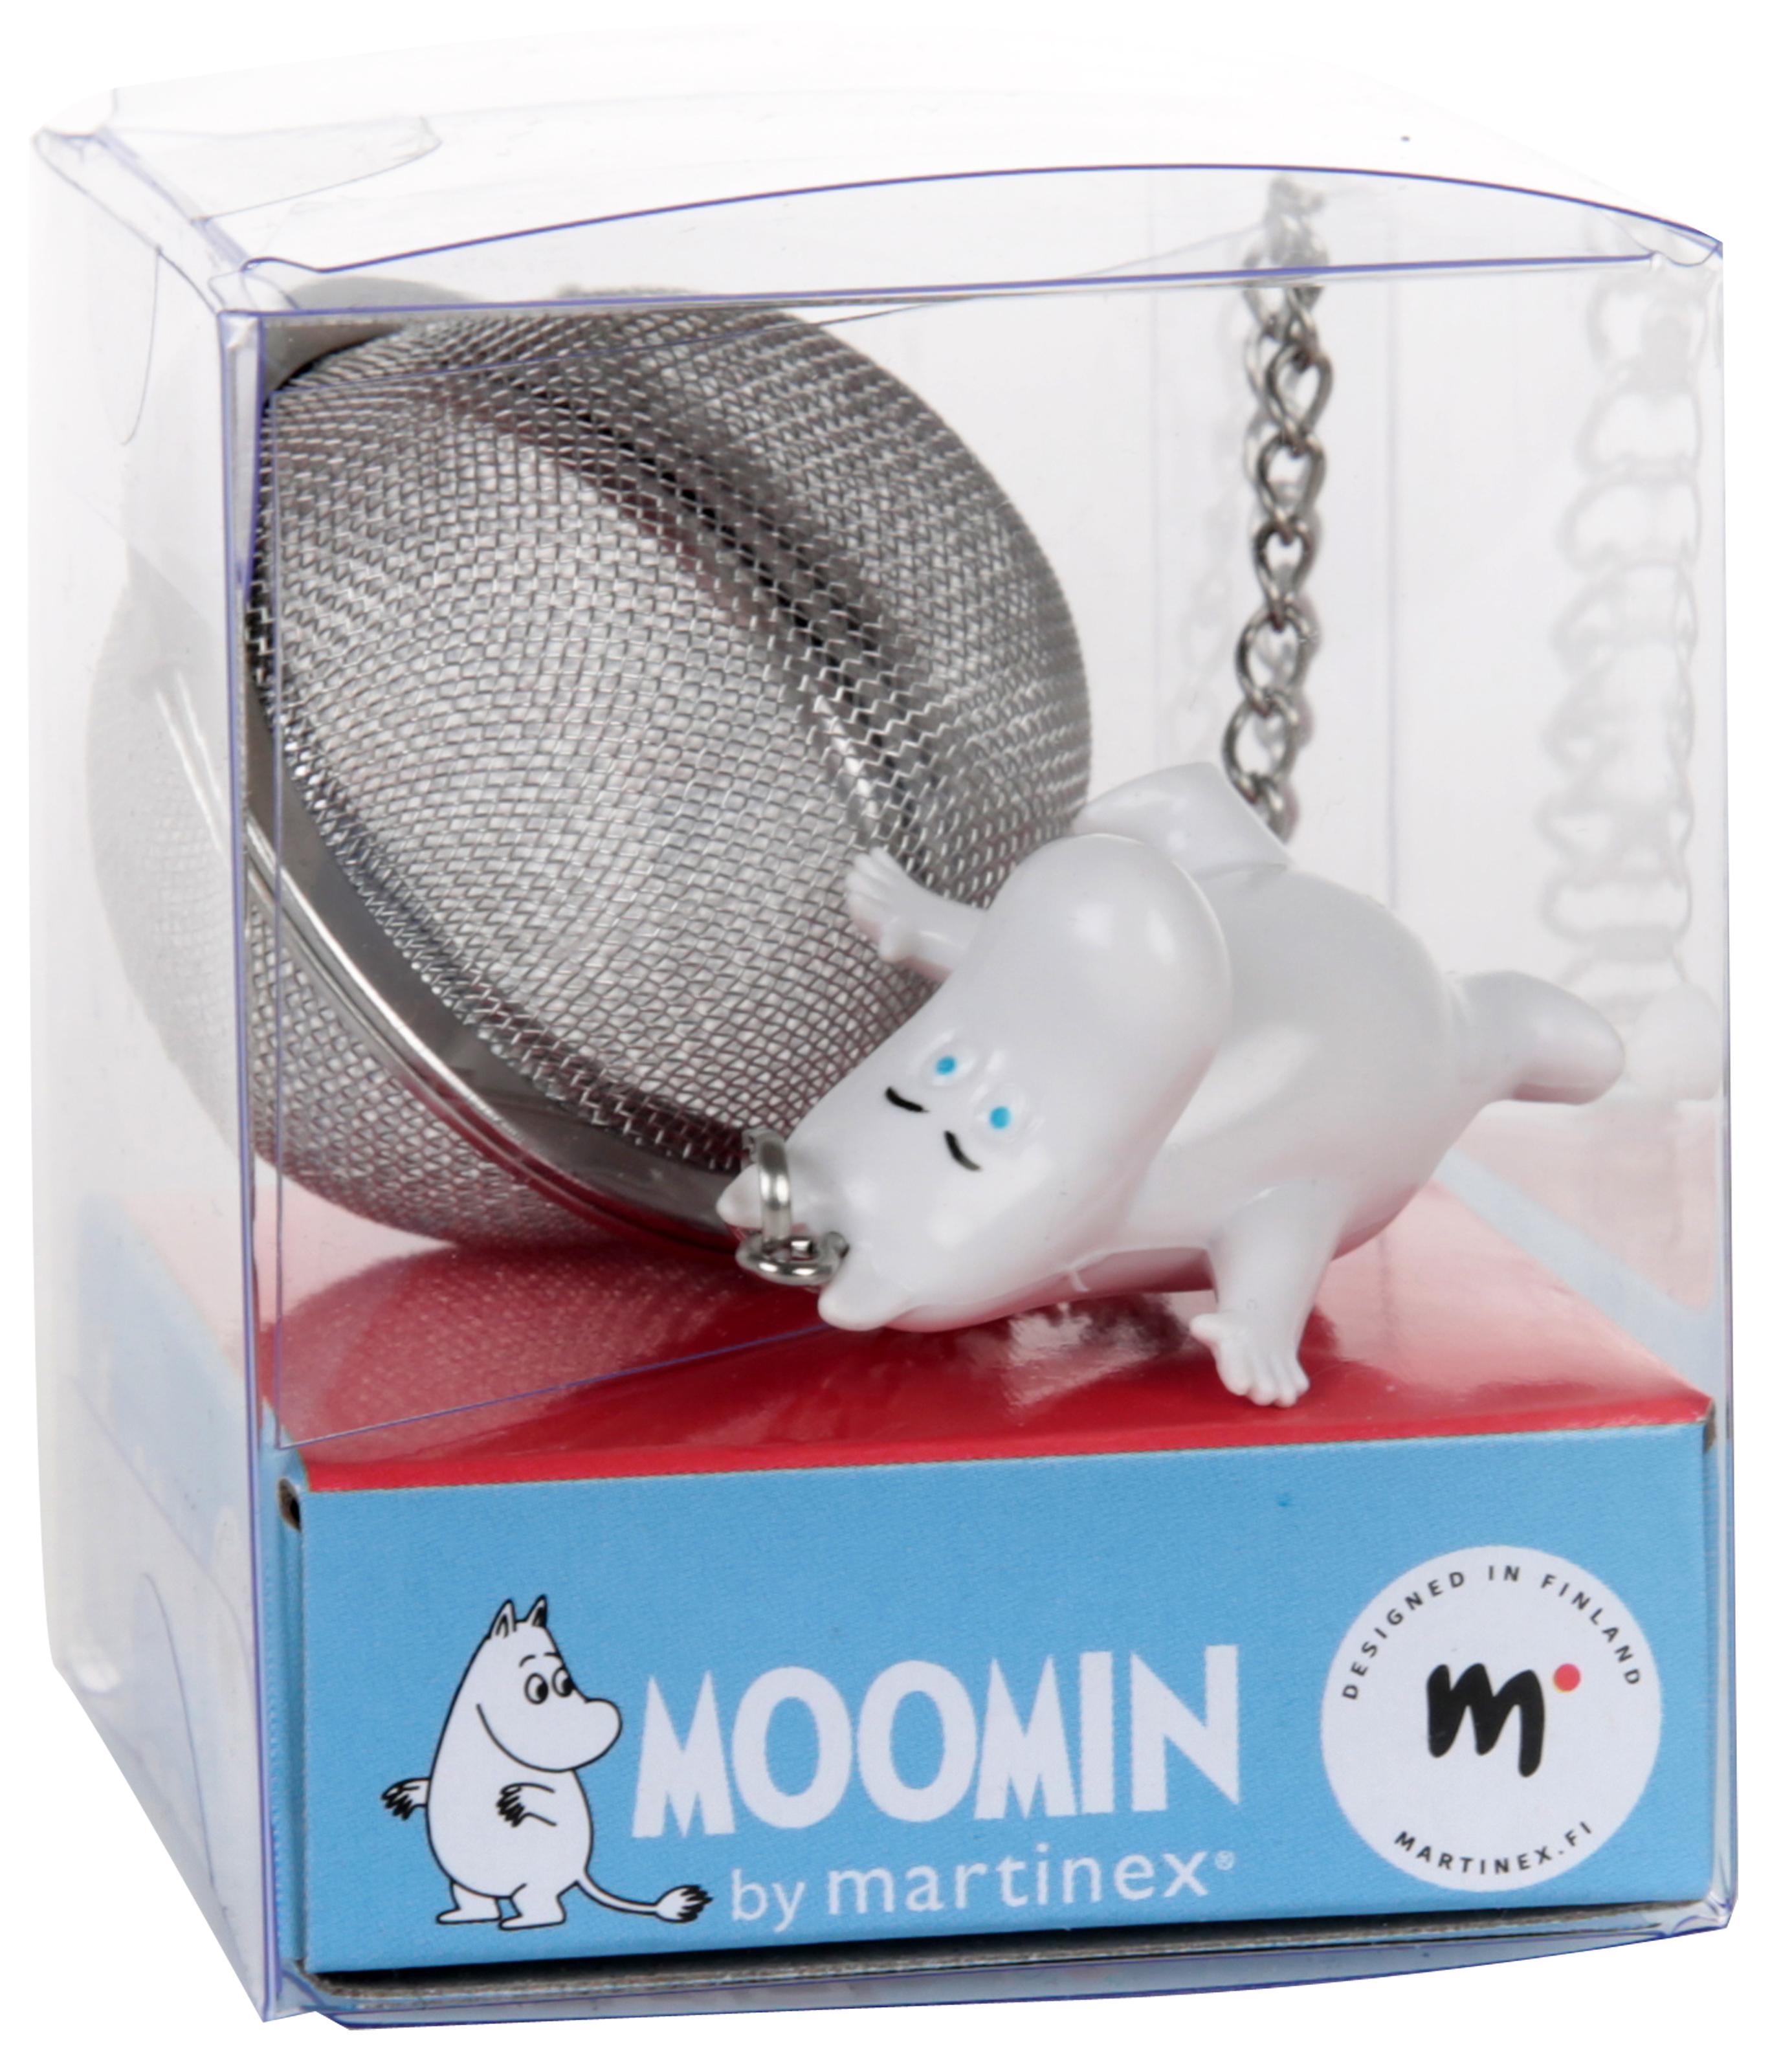 Martinex Moomintroll Tea Ball